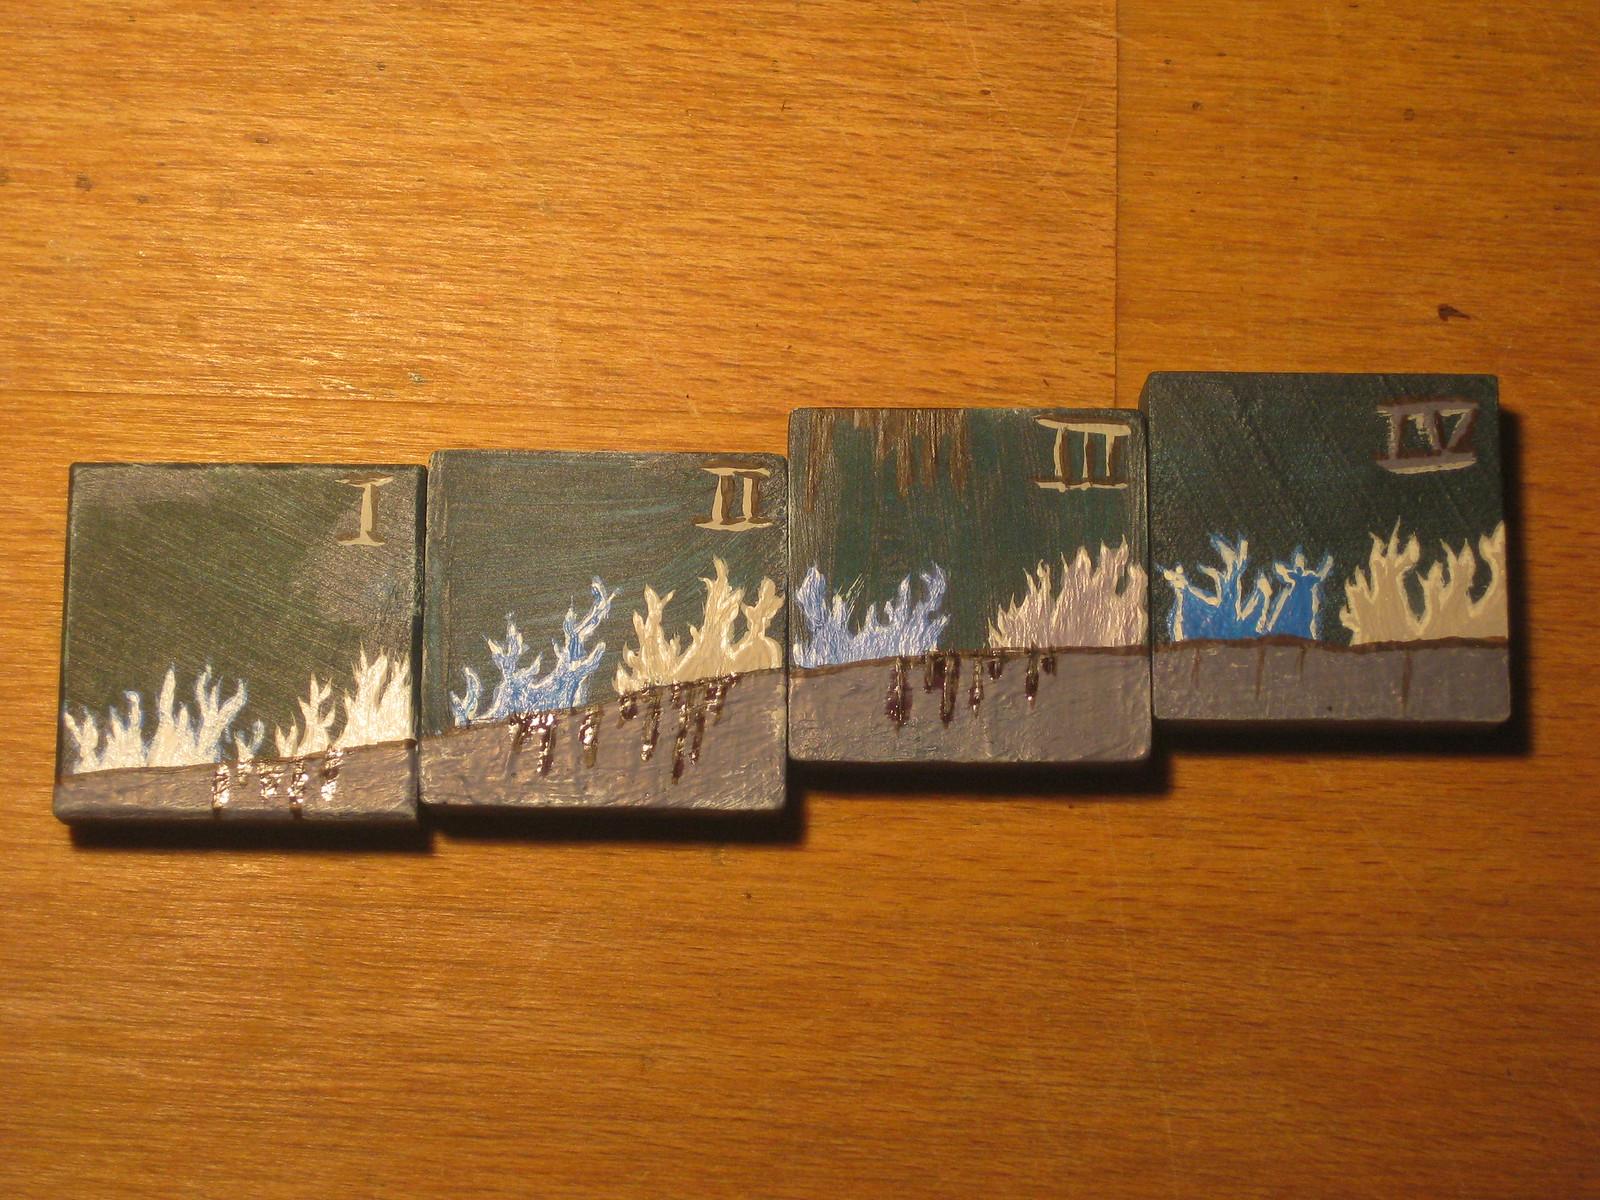 The Joy of painting... mit Hera - Seite 5 29440602904_8c92cfce9a_h